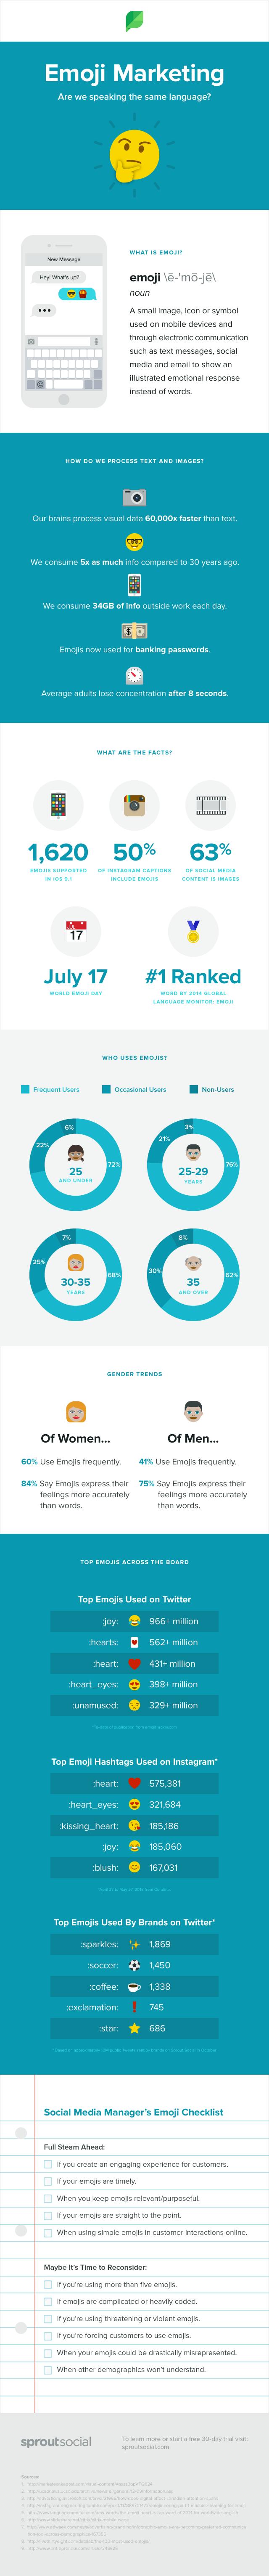 infographie emoji marketing